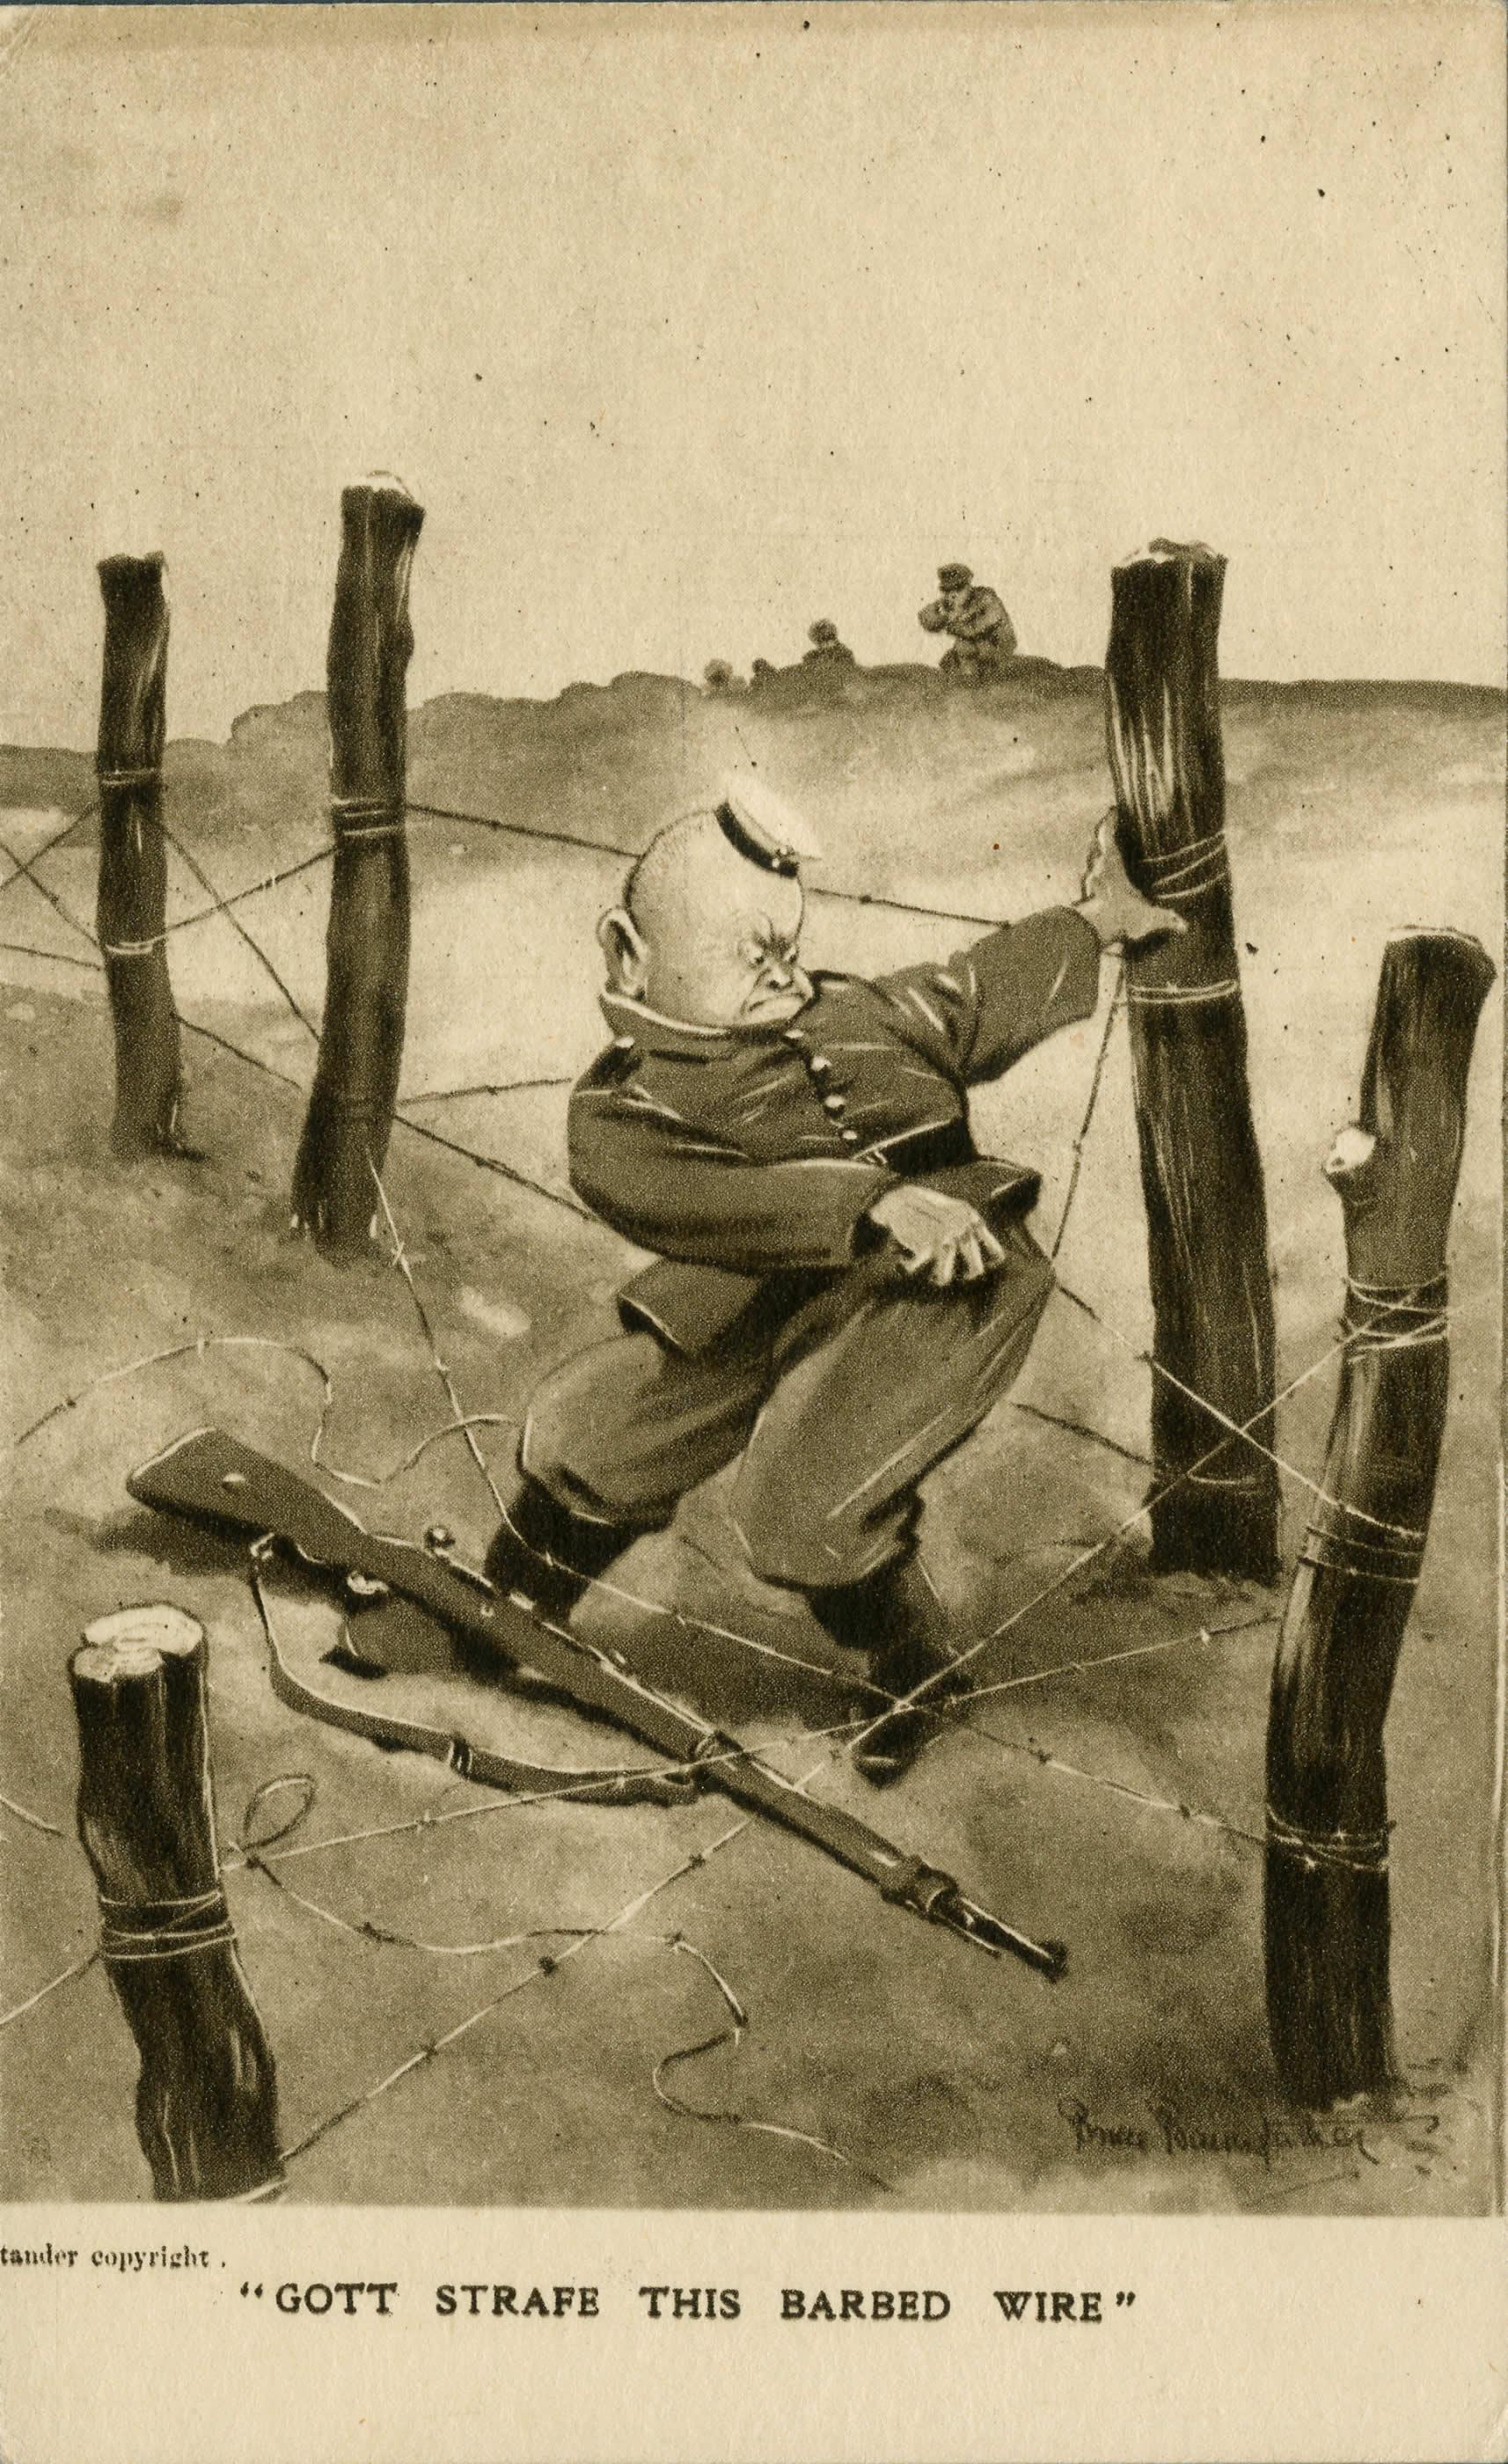 <i>Gott Strafe This Barbed Wire</i>